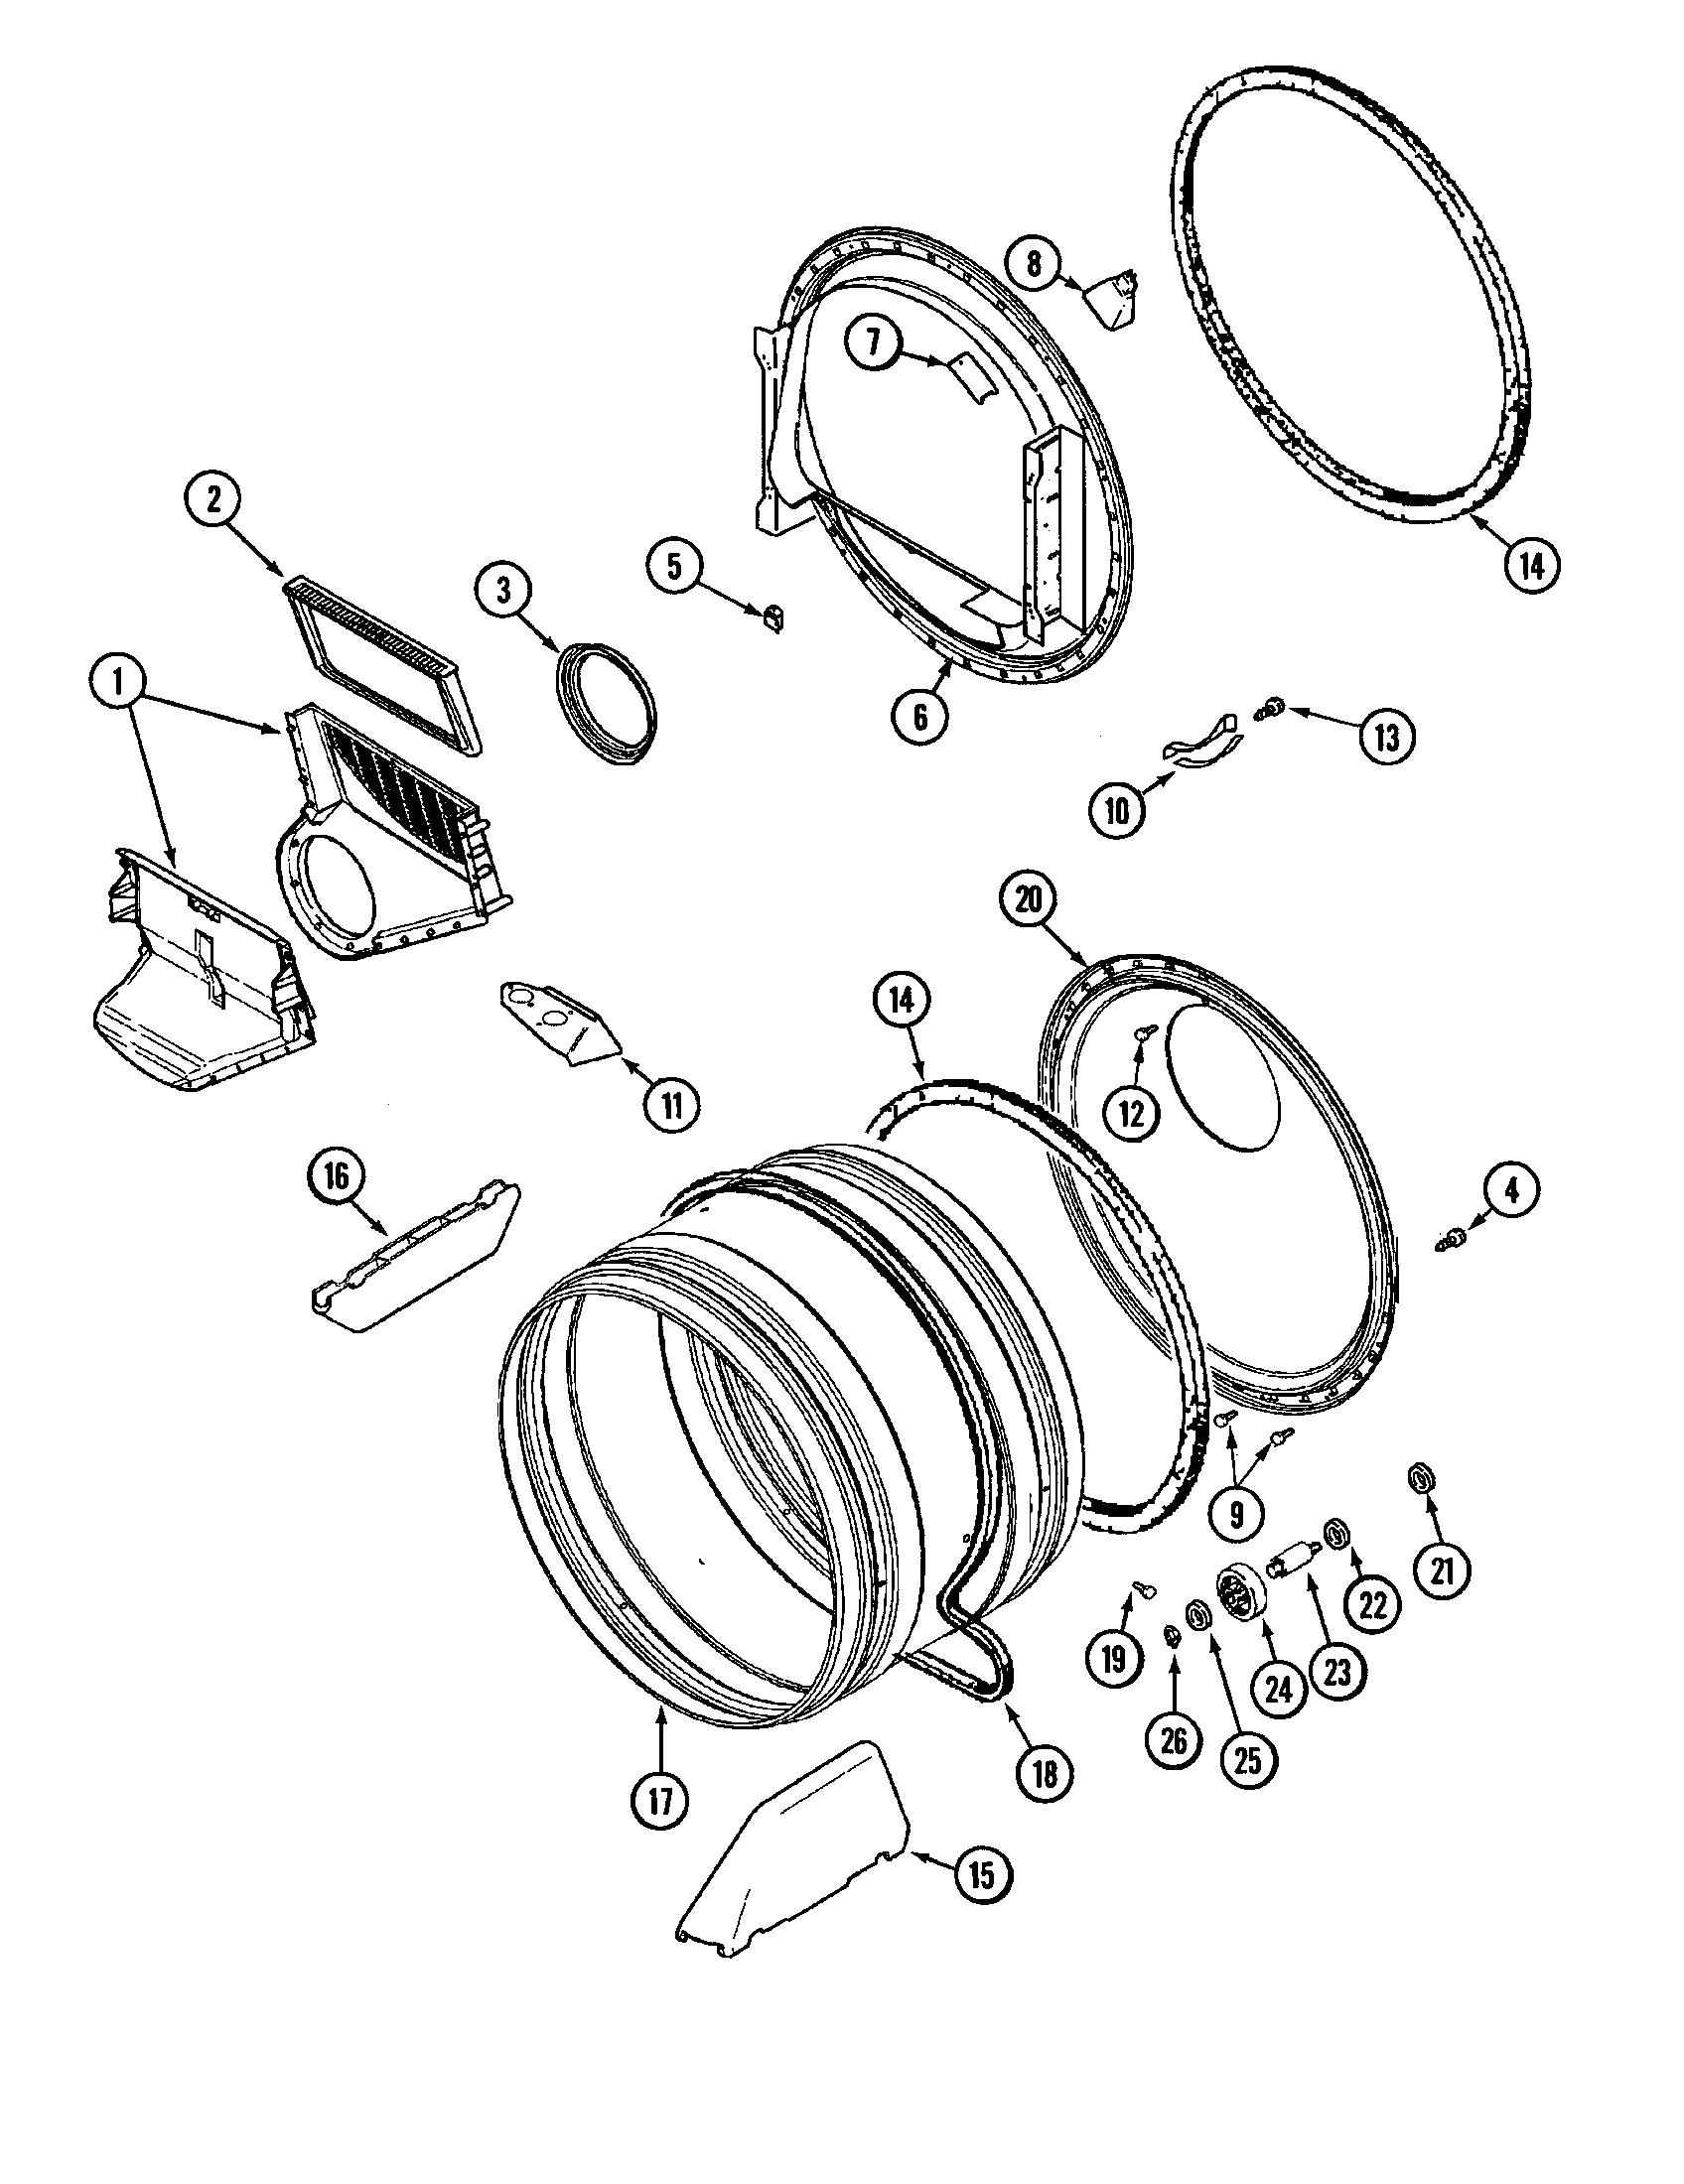 TUMBLER Diagram & Parts List for Model mdg7400aww Maytag